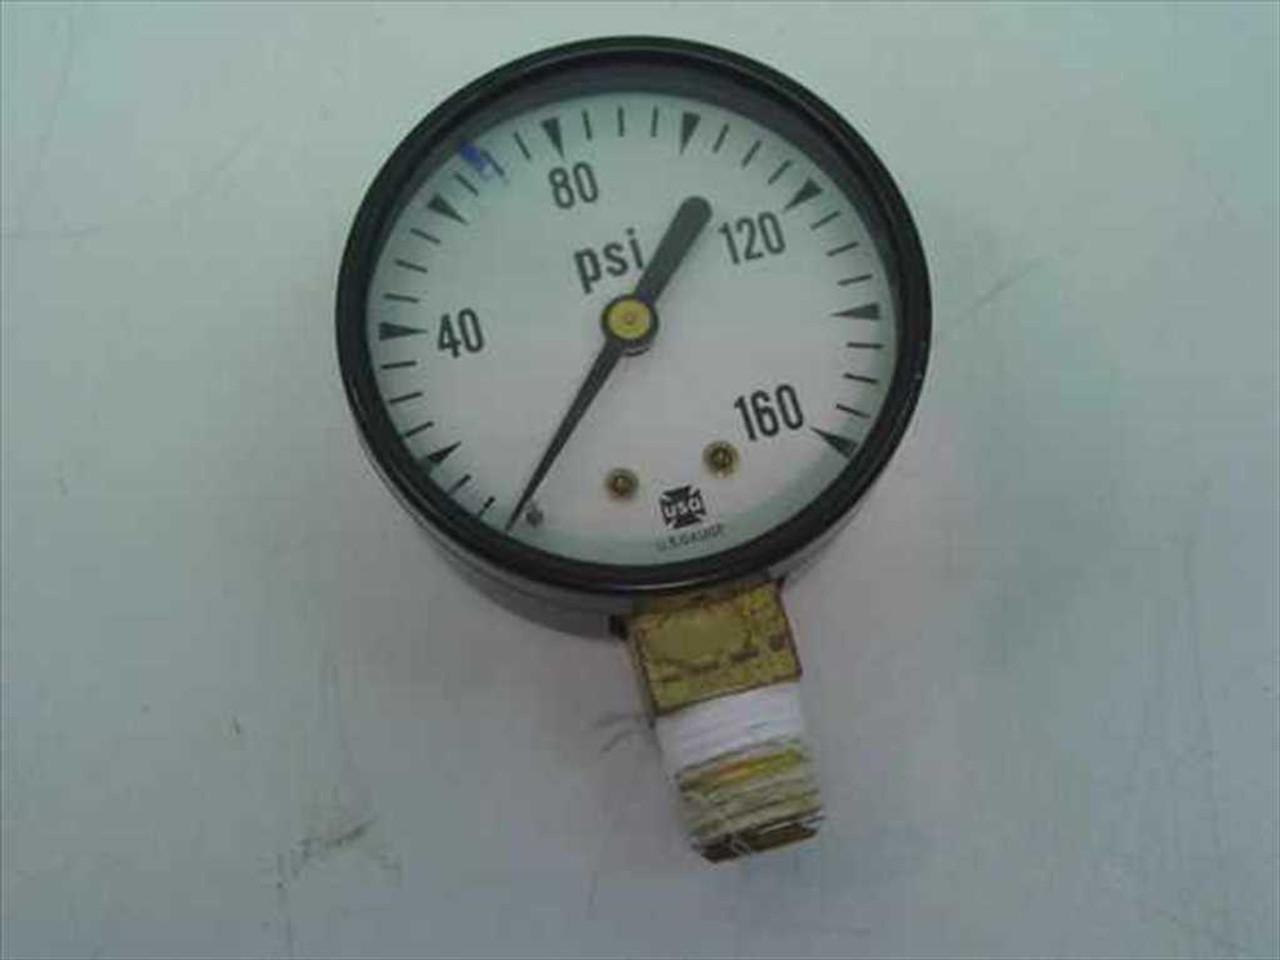 USG P500 US Gauge Pressure Gauge   RecycledGoods.com